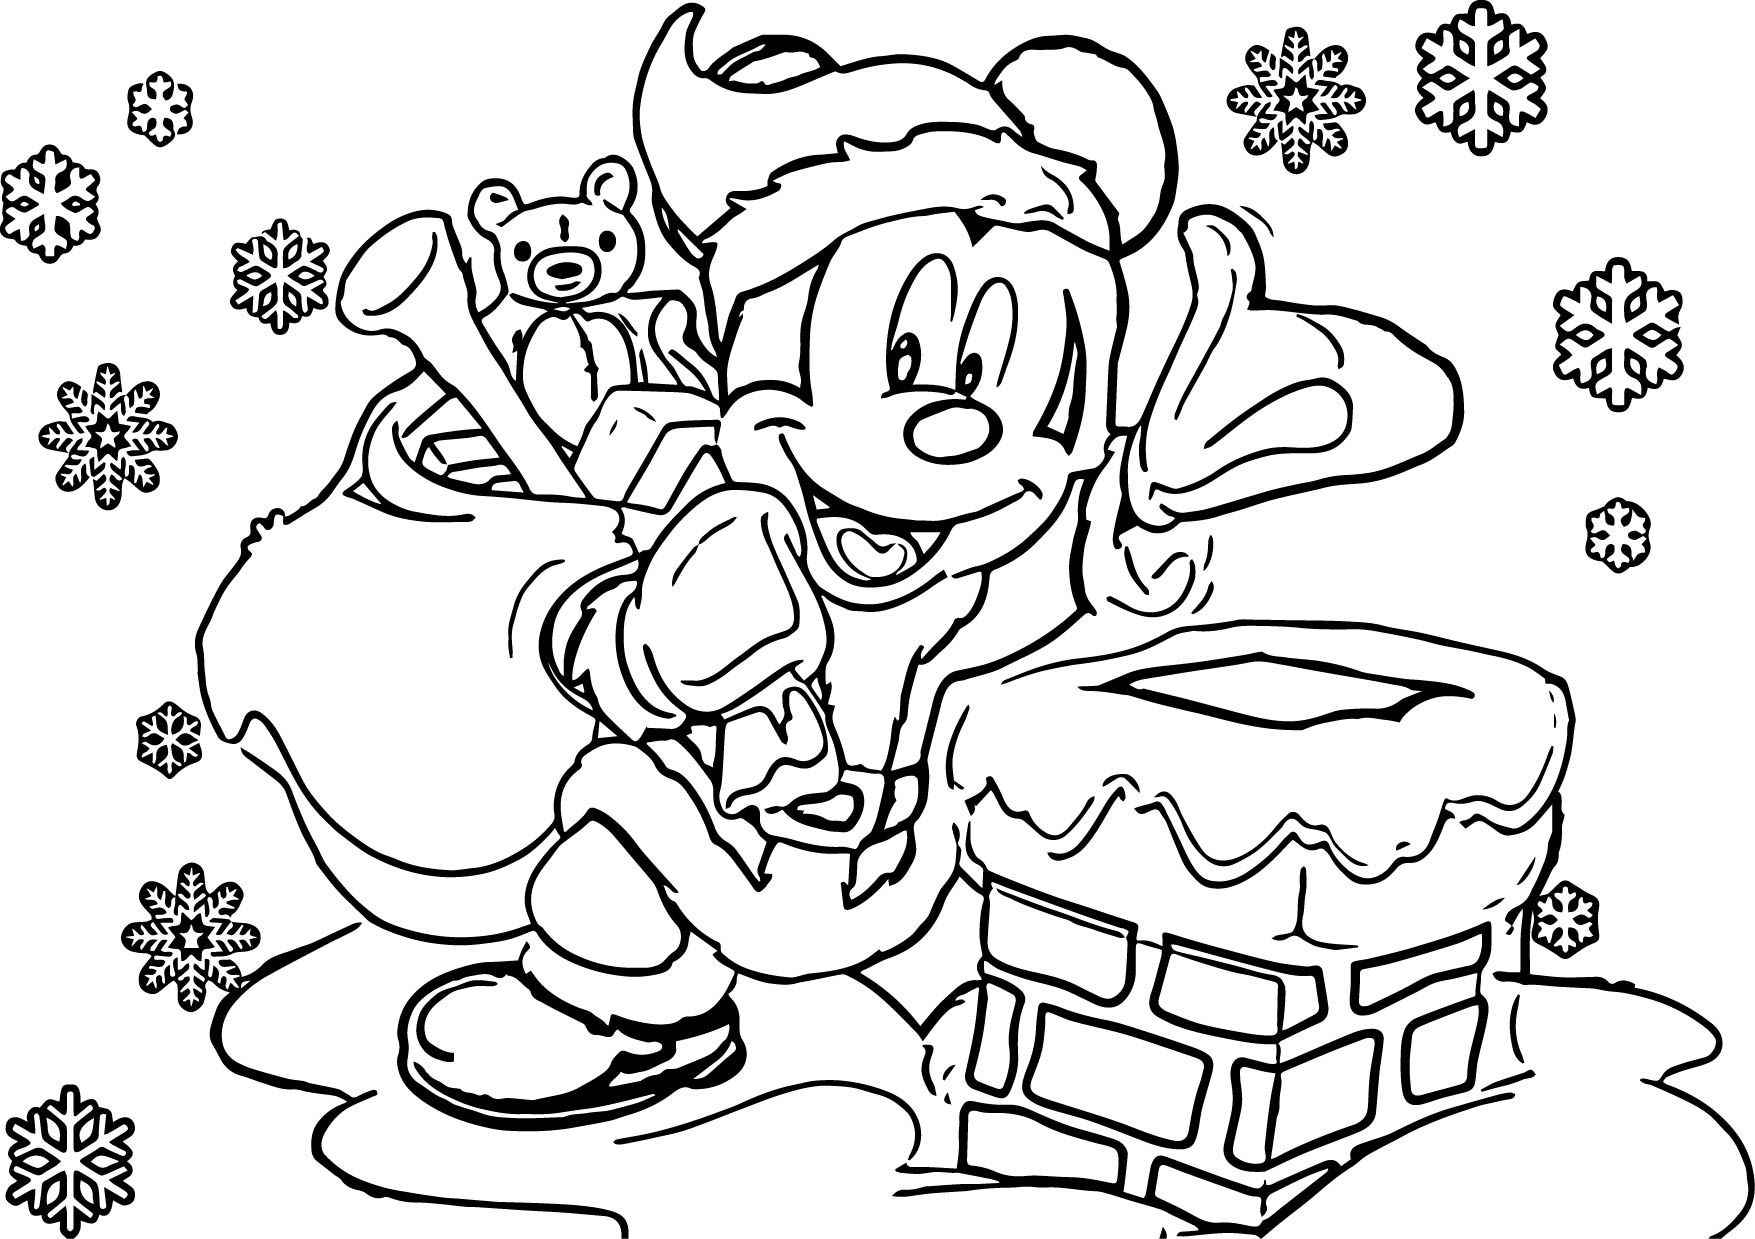 Christmas Cartoon Characters Coloring Pages At